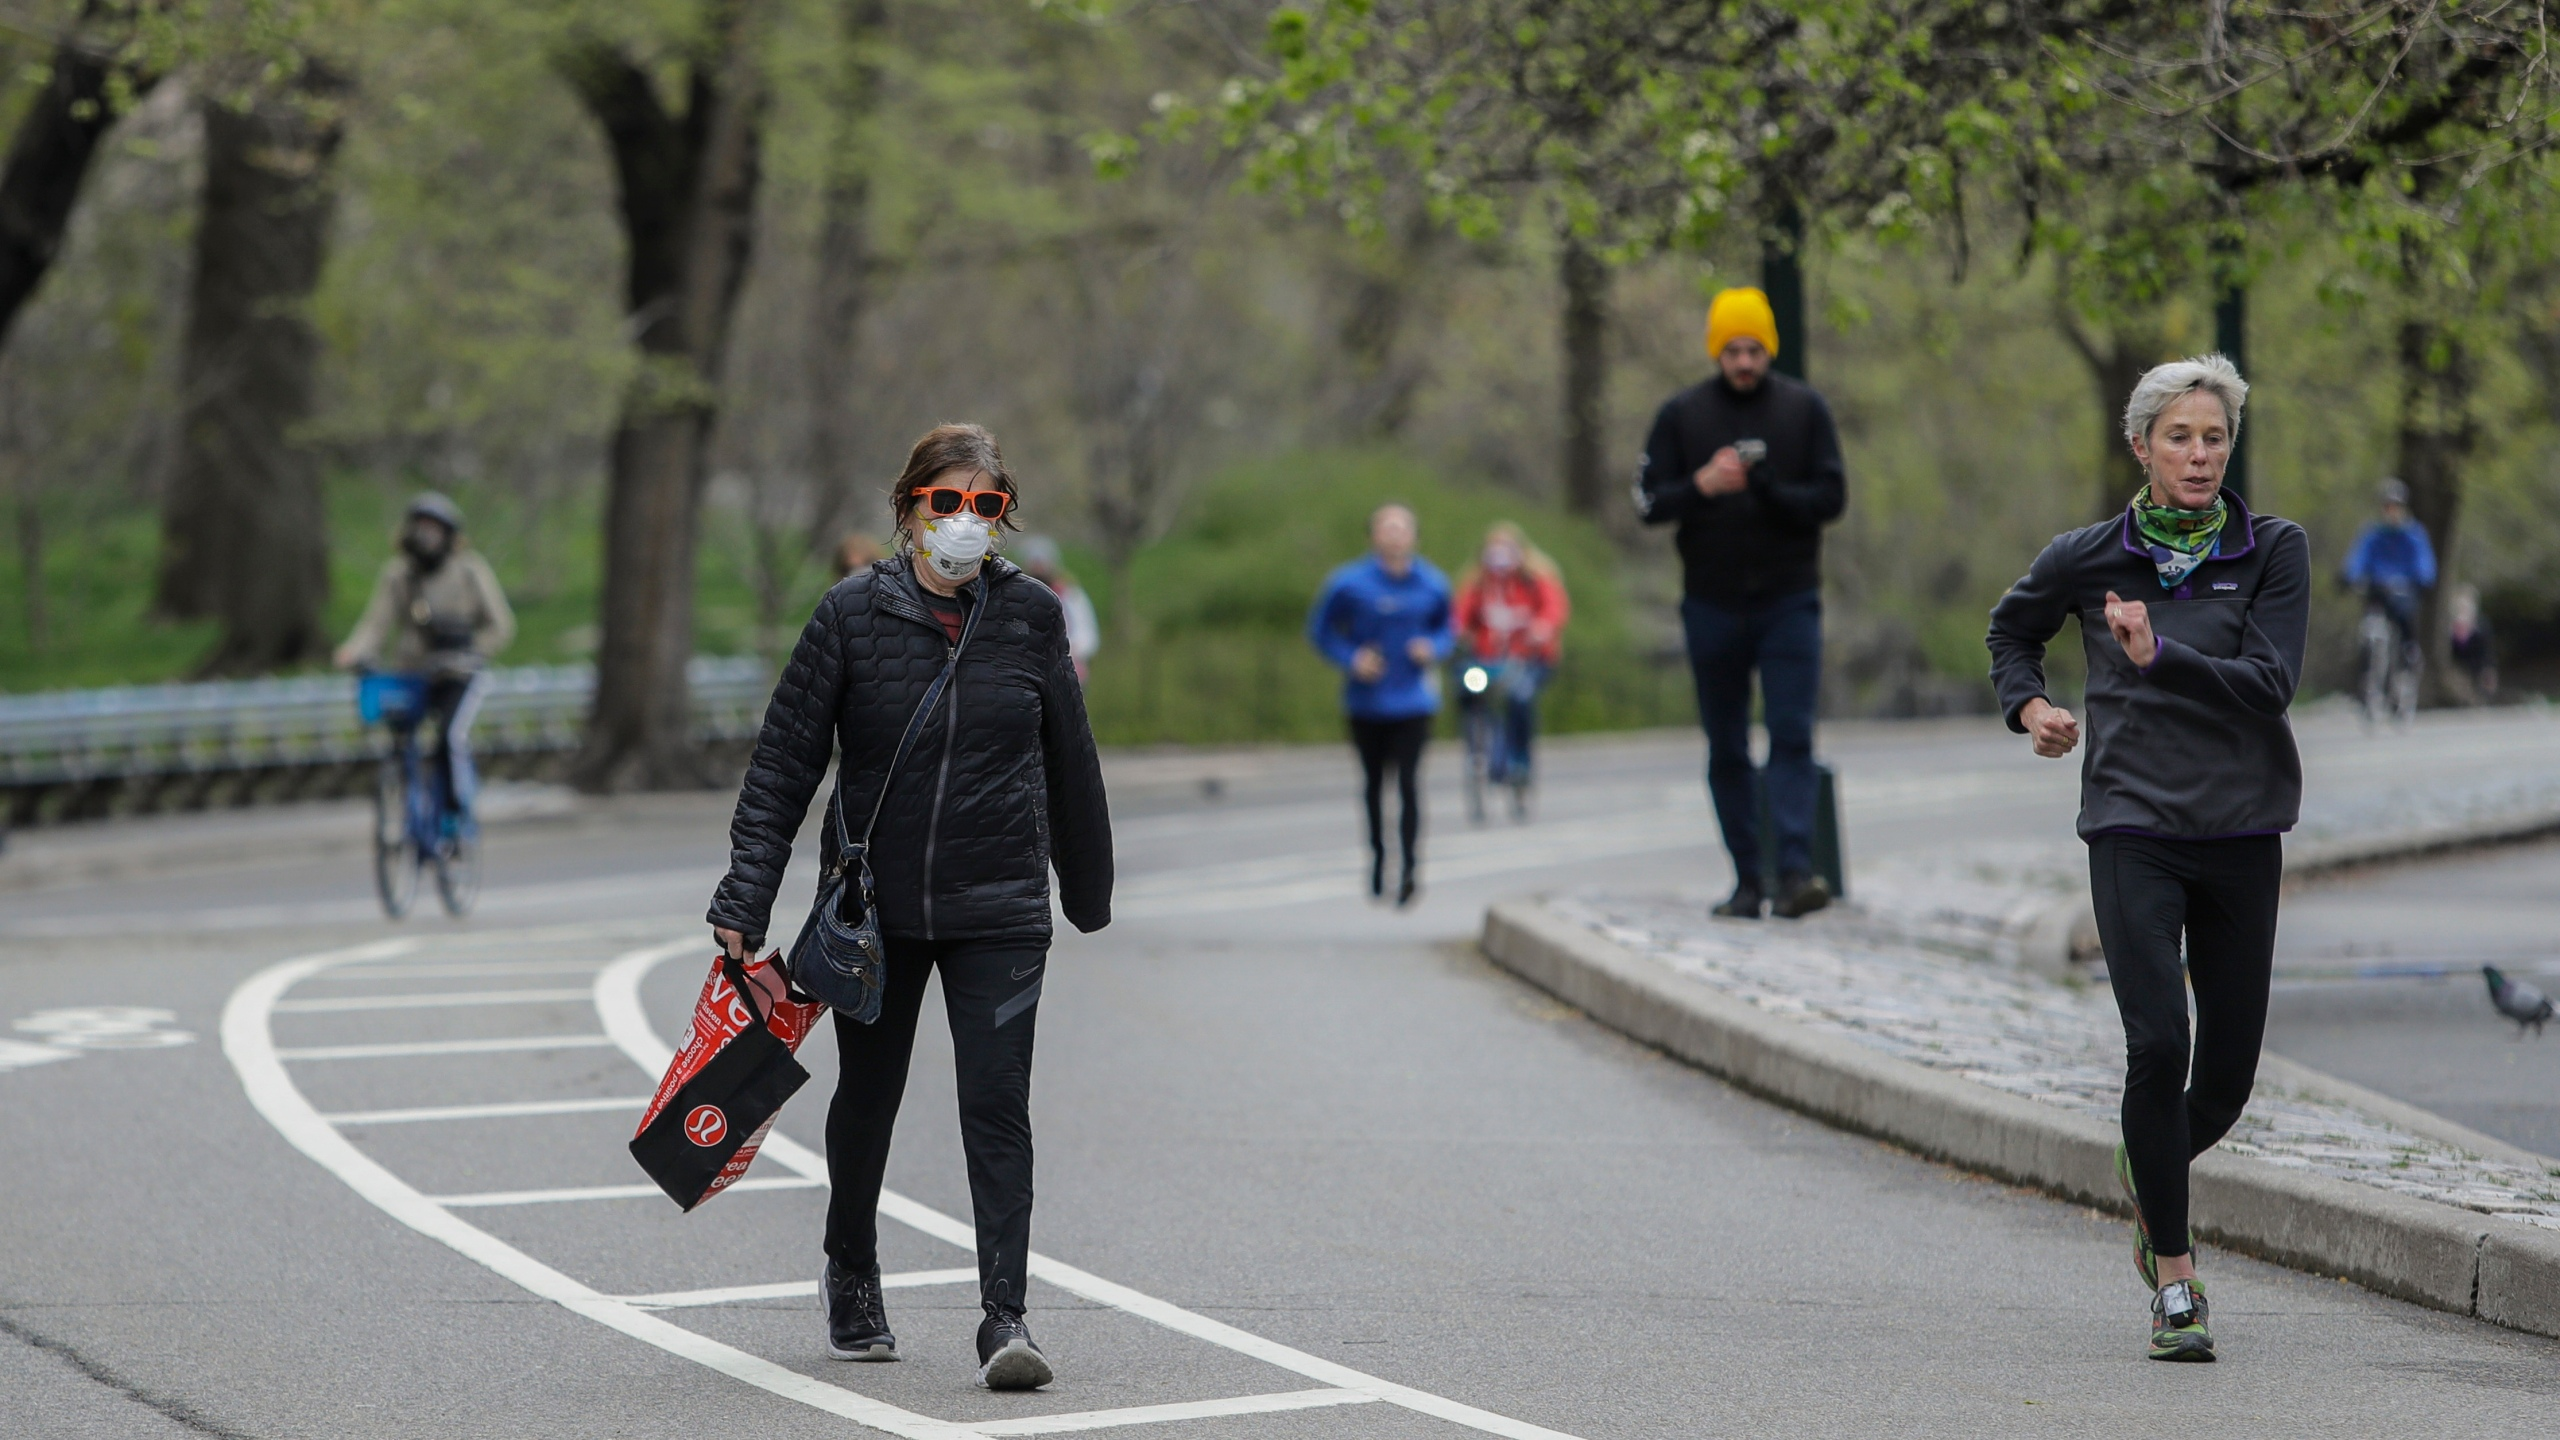 Central Park social distancing coronavirus